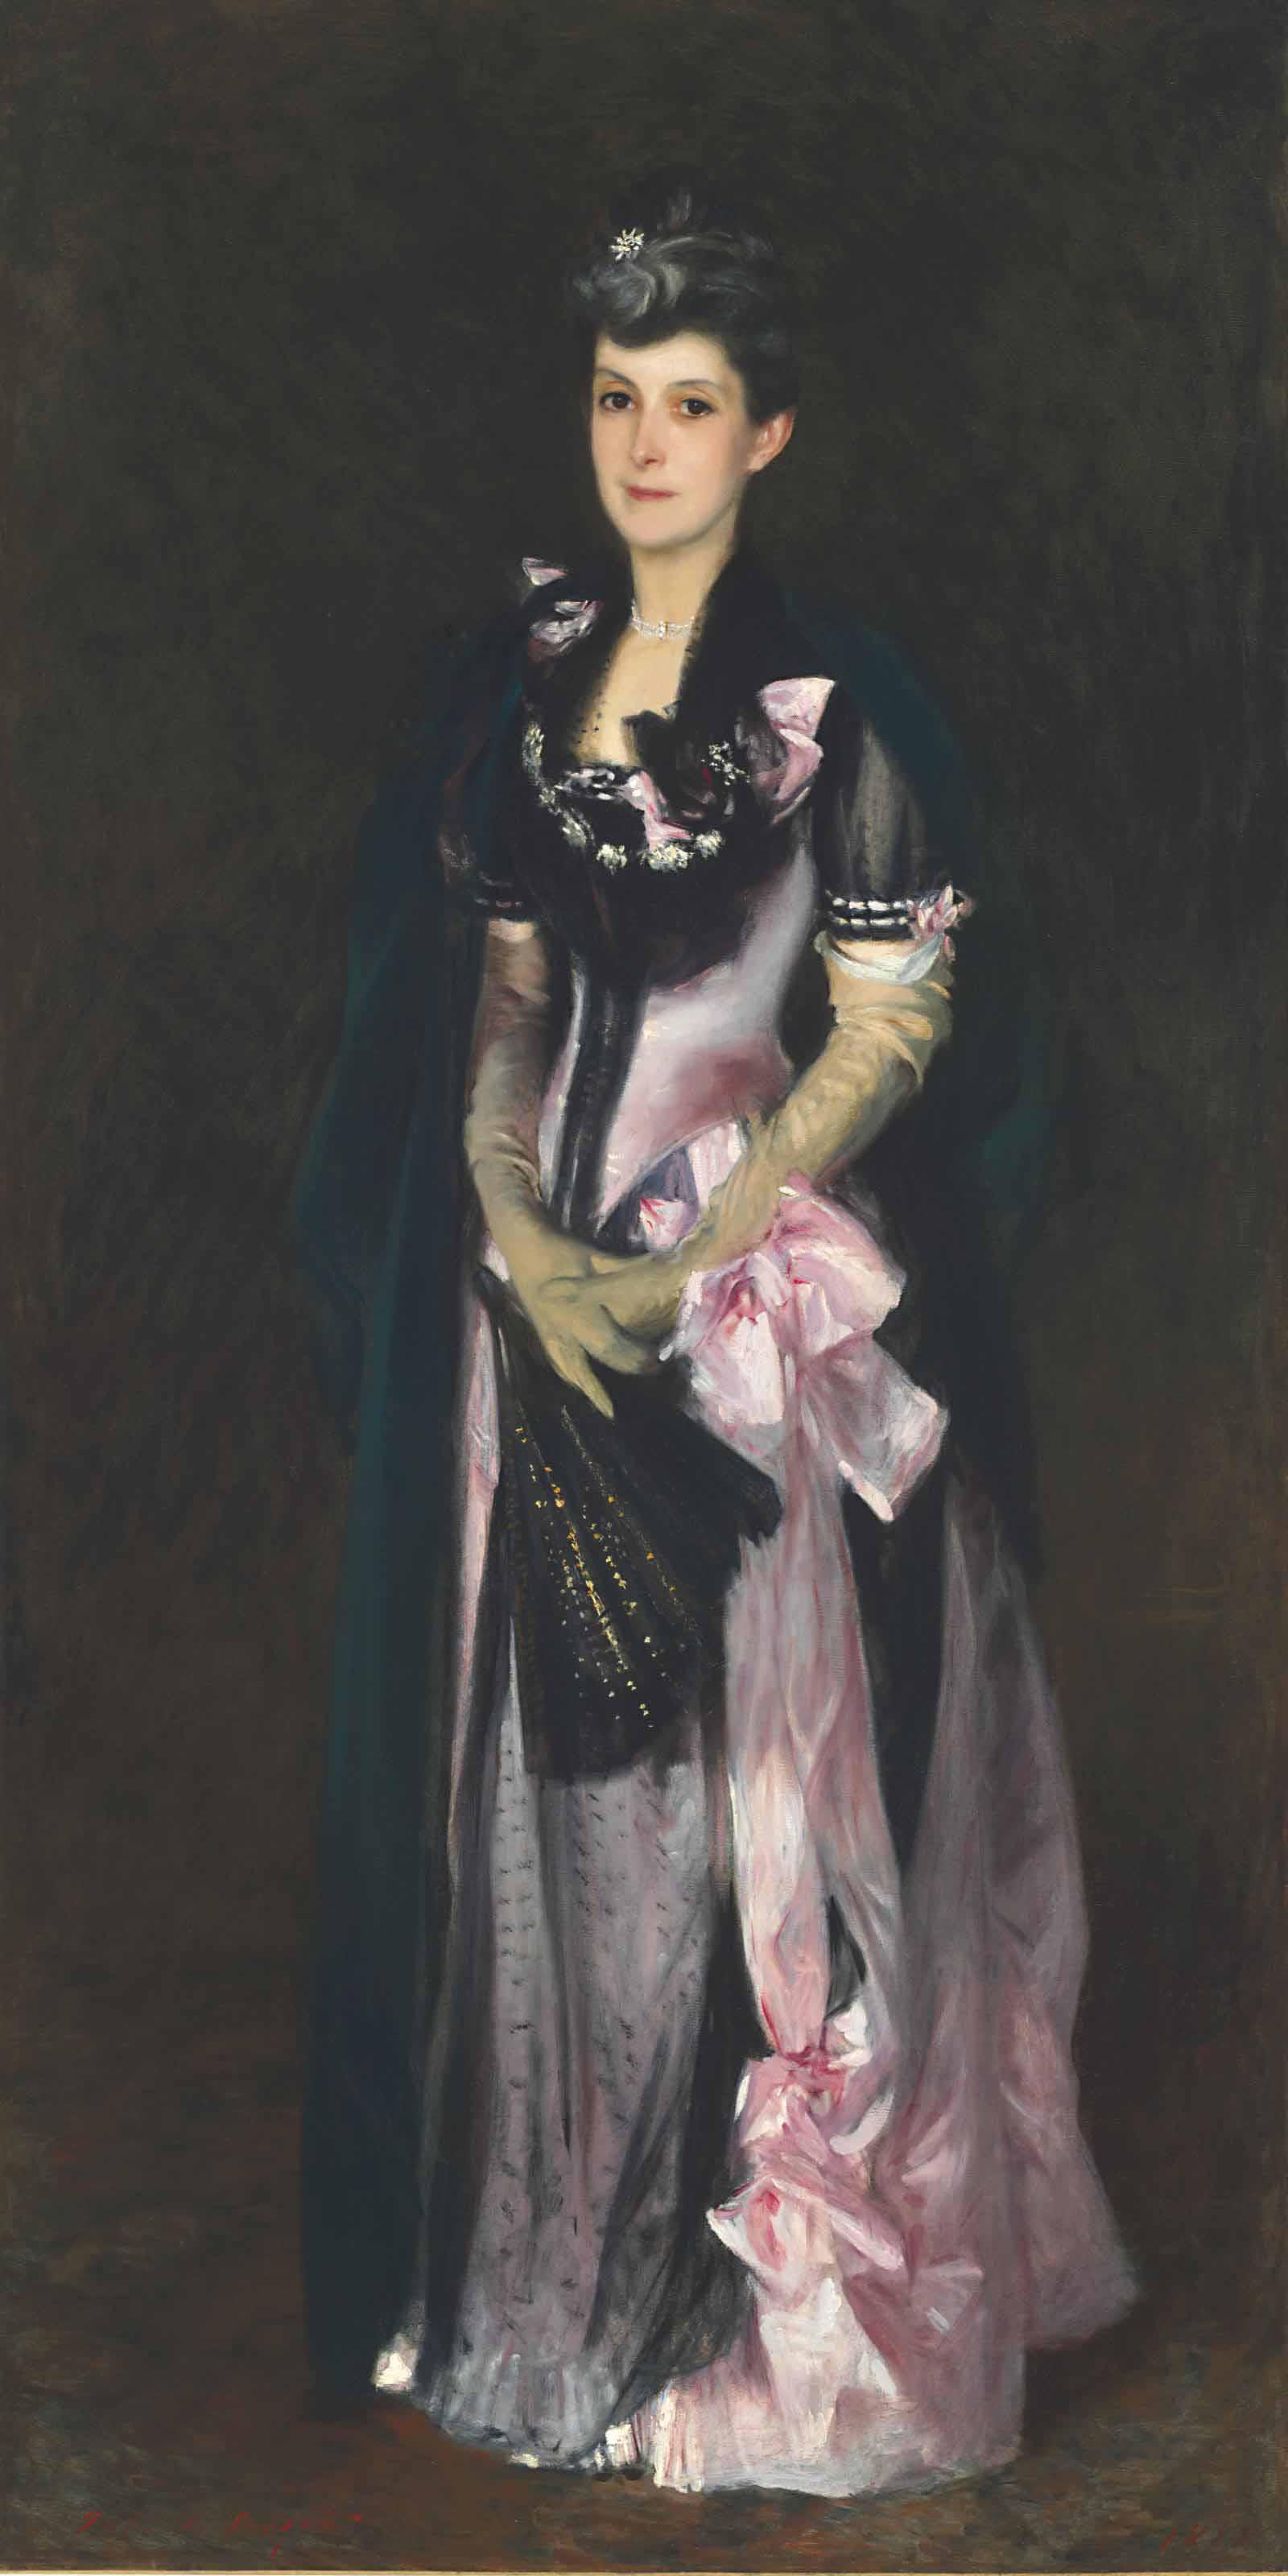 Audio: John Singer Sargent, Mrs. Richard H. Derby